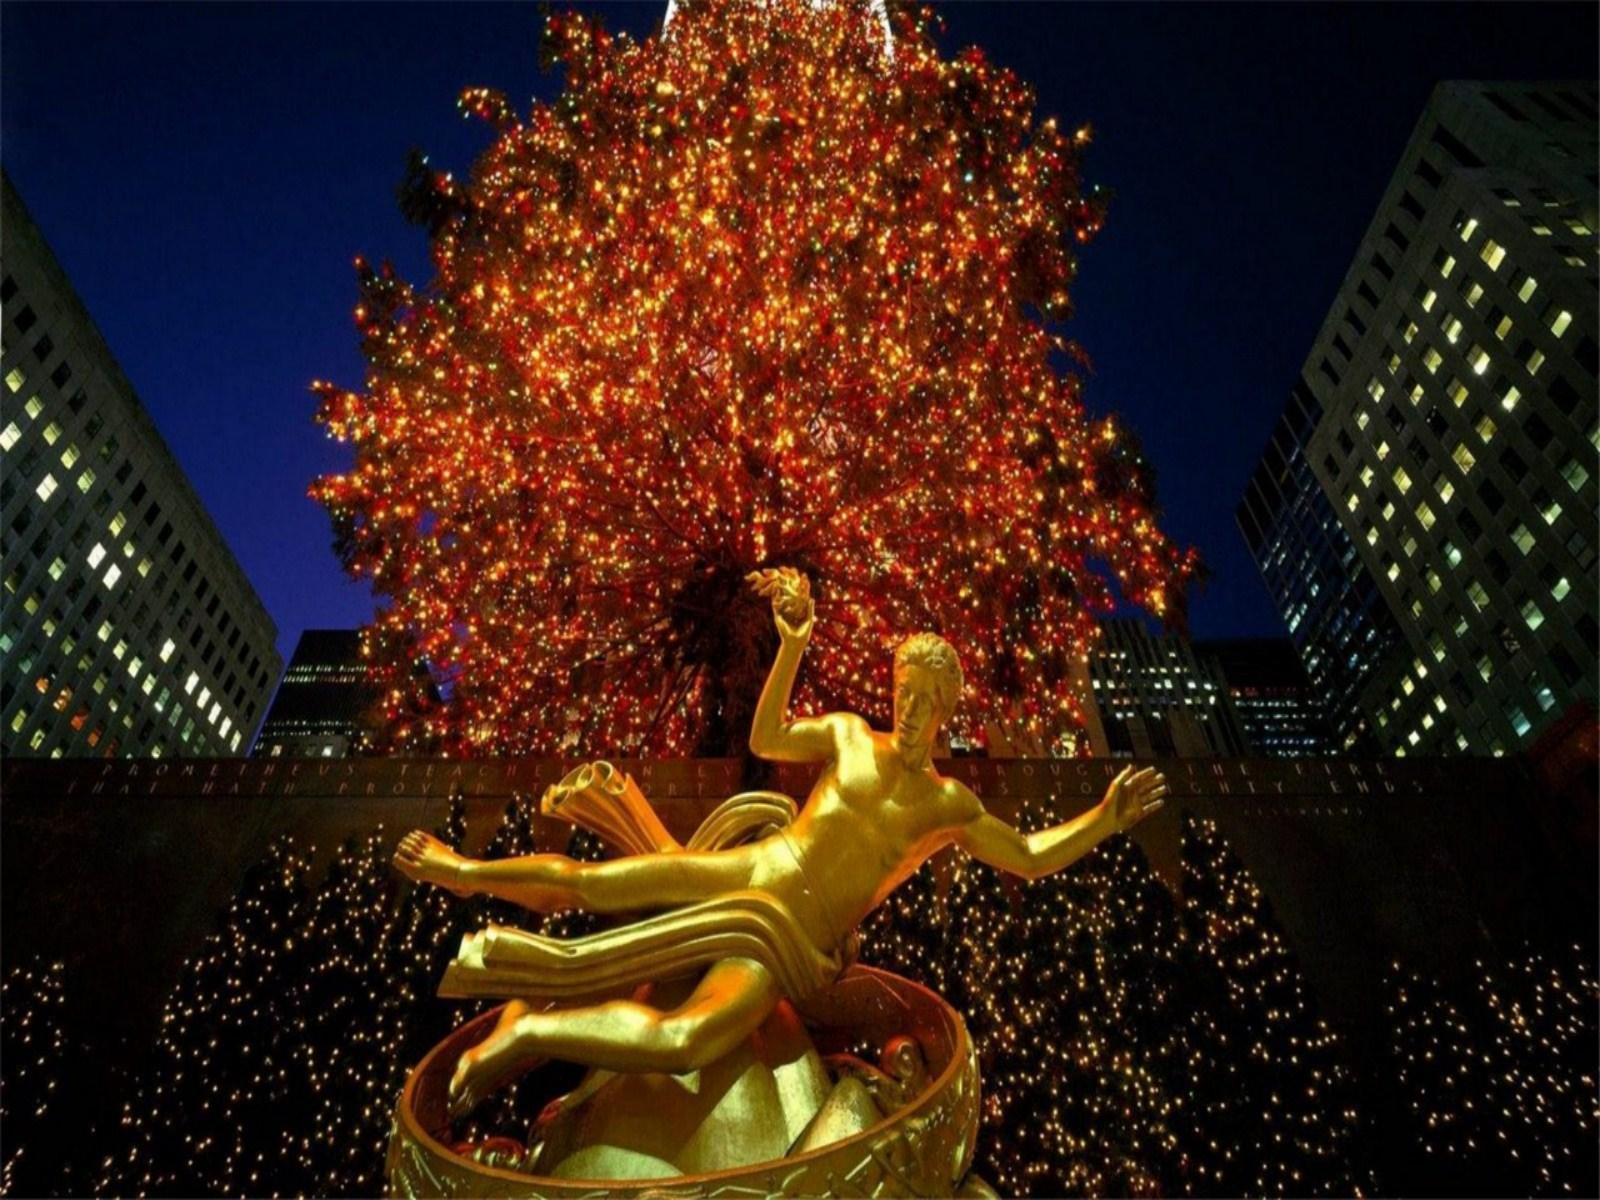 New York Christmas Iphone Wallpaper New york city christmas 1600x1200